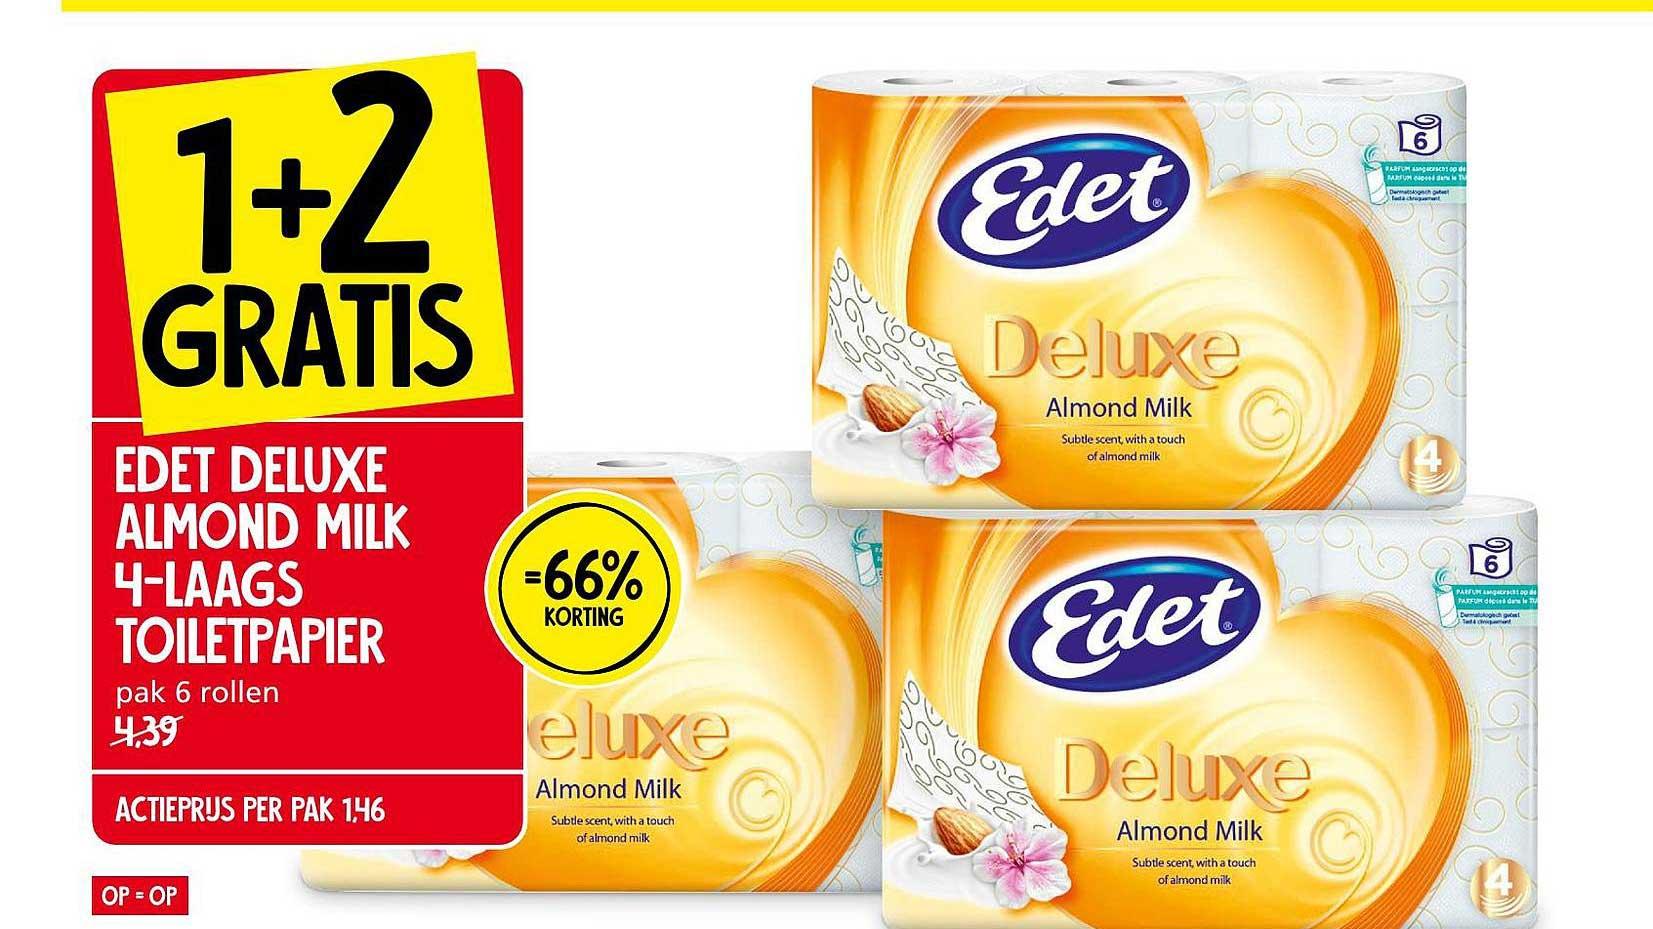 Jan Linders Edet Deluxe Almond Milk 4-Laags Toiletpapier 1+2 Gratis 66% Korting